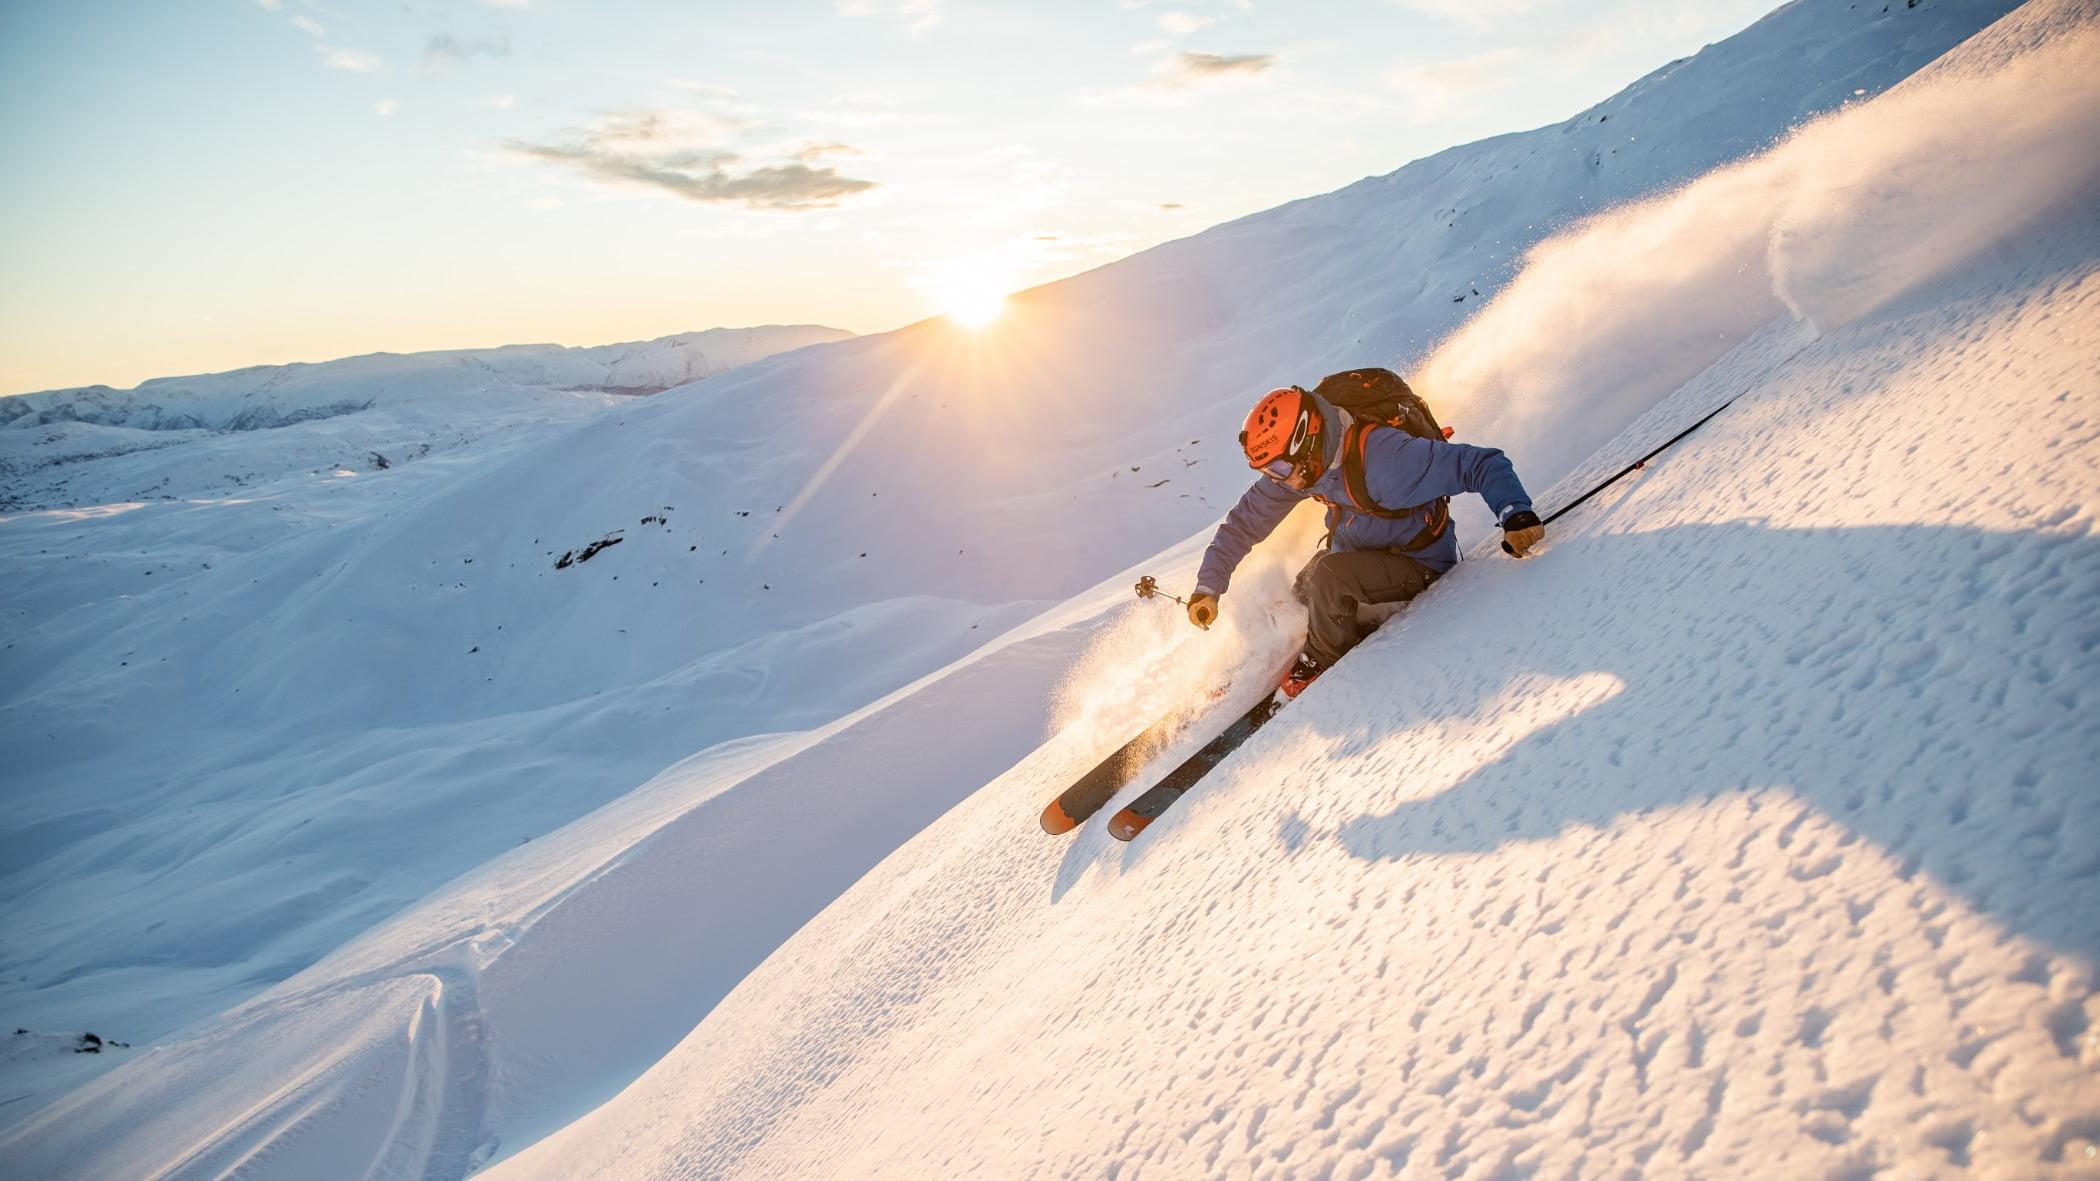 People in nature, Glacial landform, Outdoor recreation, Winter sport, Terrain, Piste, Snow, Slope